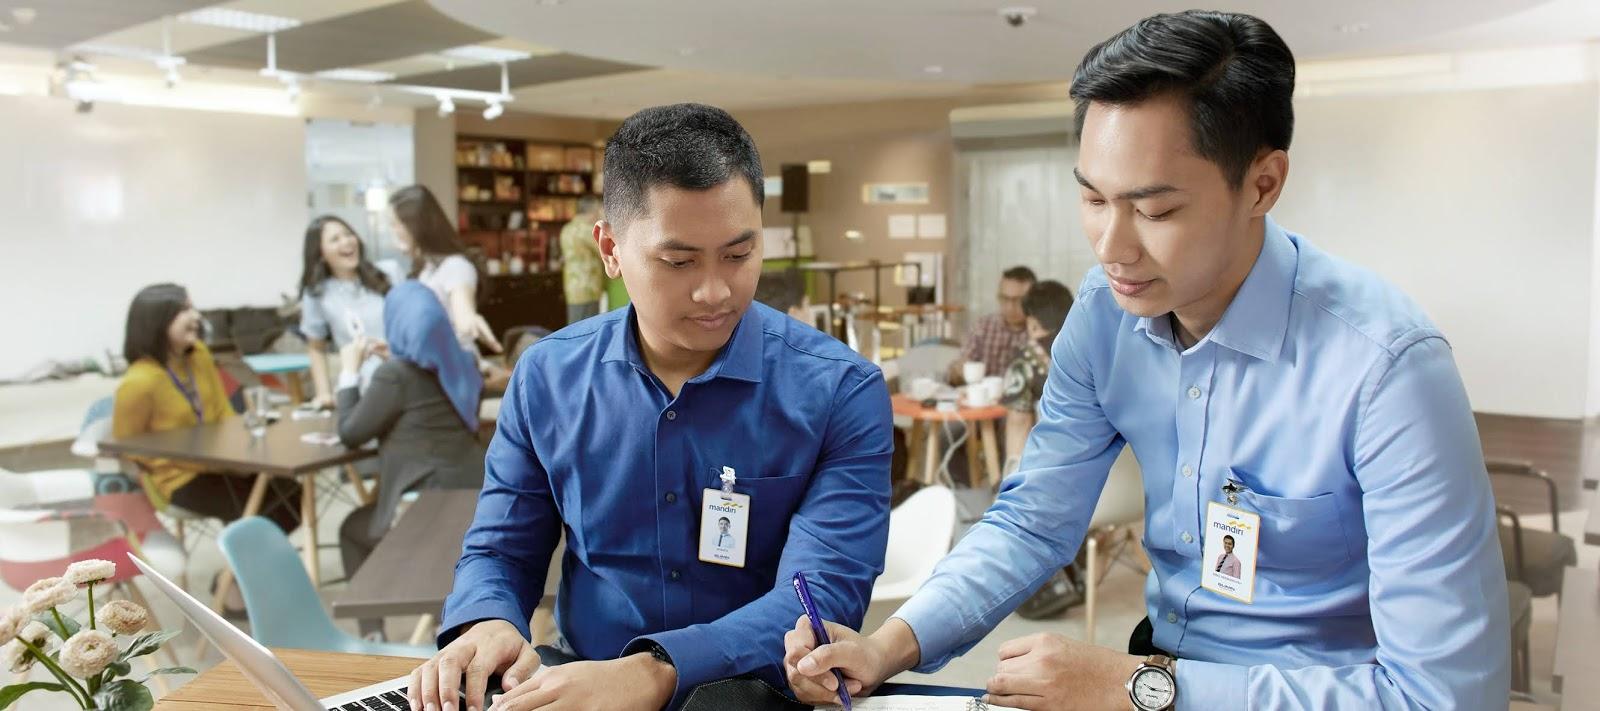 Rekrutmen Mandiri Kriya Penempatan di Bank Mandiri Area Semarang Pendidikan Minimal SMA